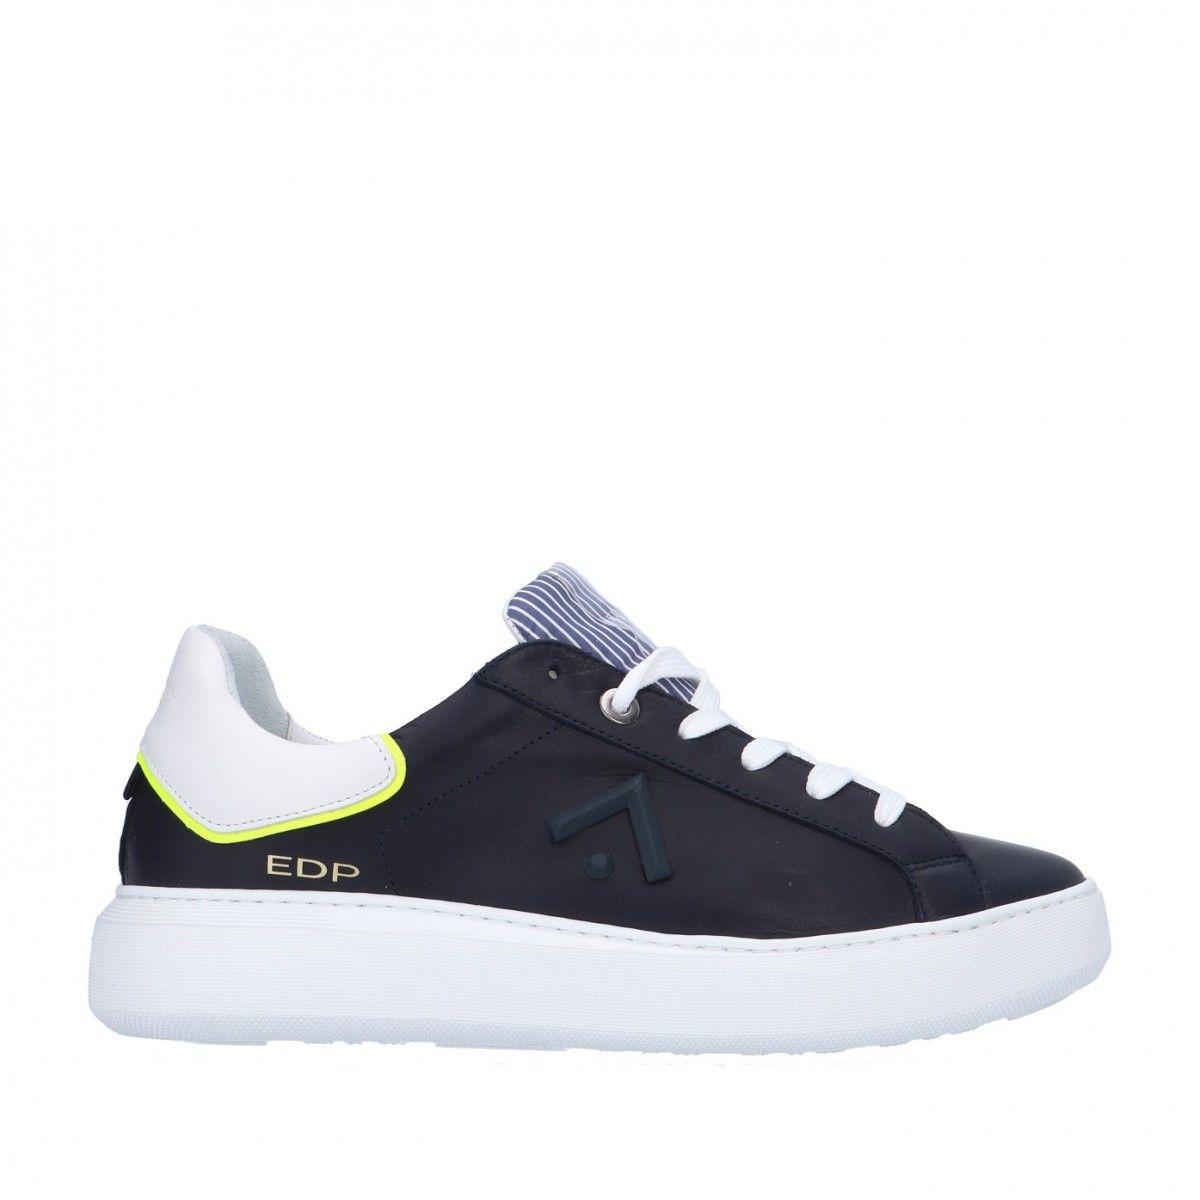 Ed parrish Sneaker Blu/giallo Gomma CKLU-VT05